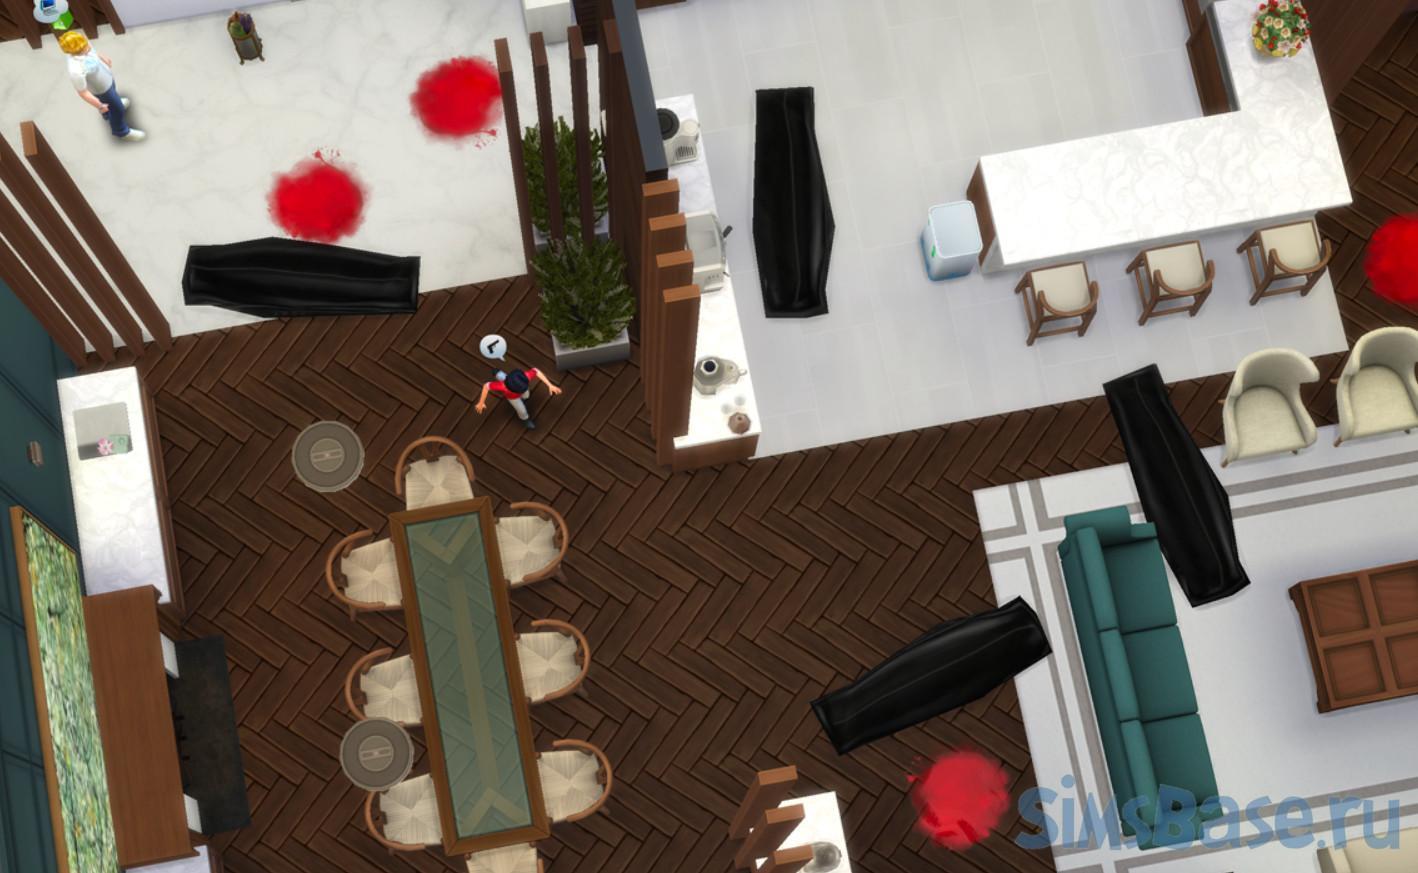 Мод «Mortem или замена Жнеца на Судмедэксперта» от simrealist для Sims 4